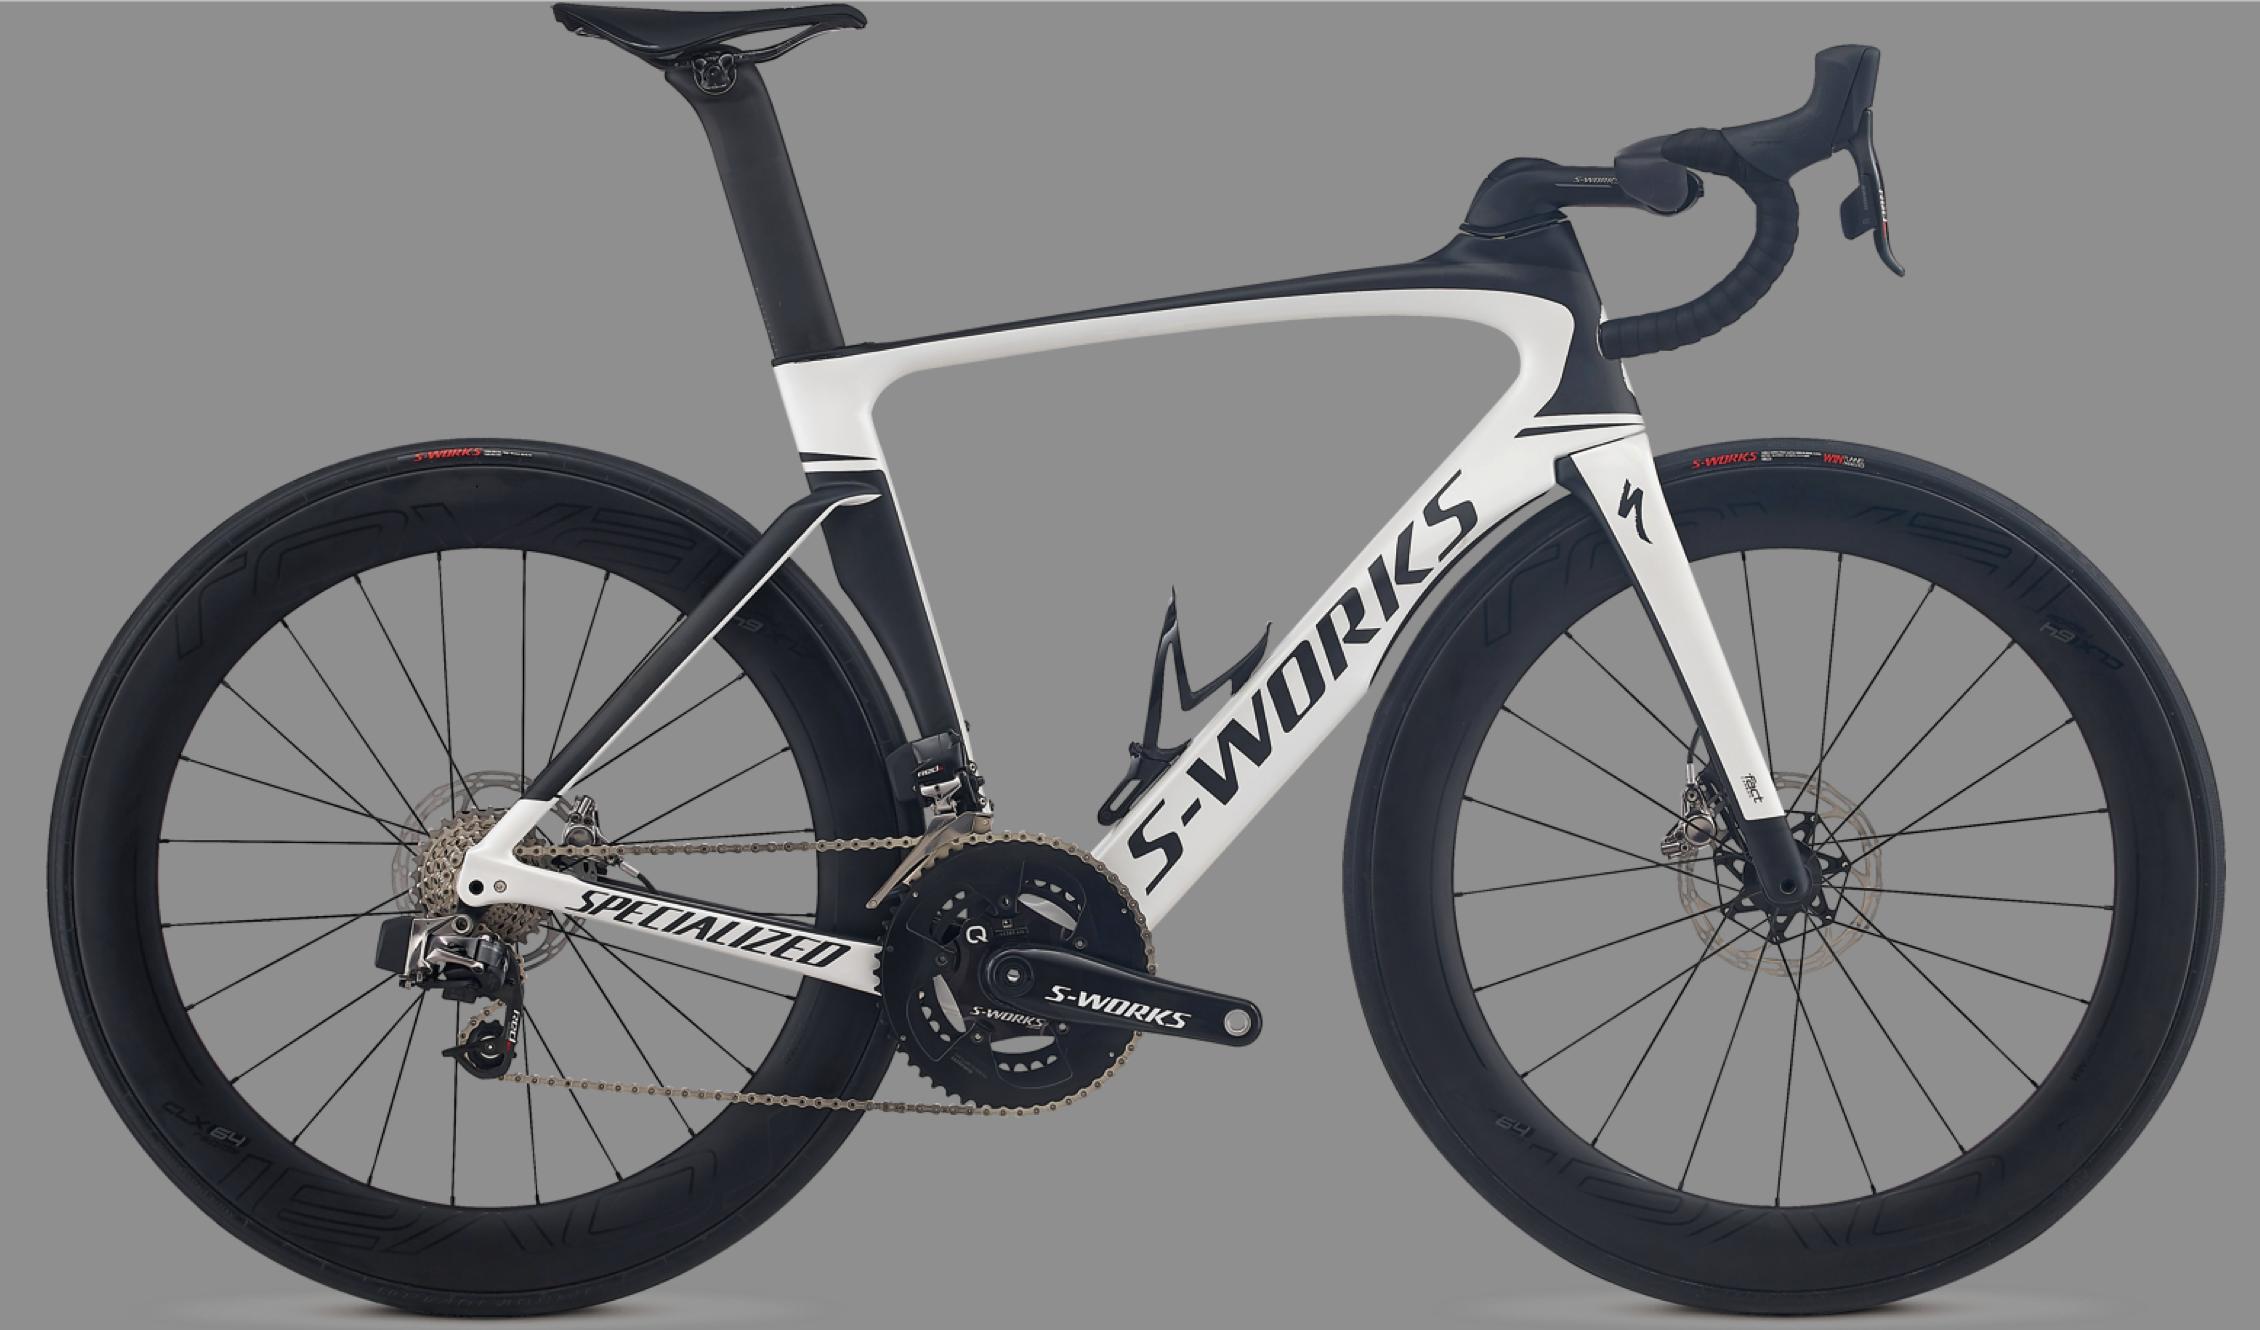 competitive price 719e7 a9515 BDC-MAG.com | Bici da corsa - Bici da corsa | Prezzi gamma ...